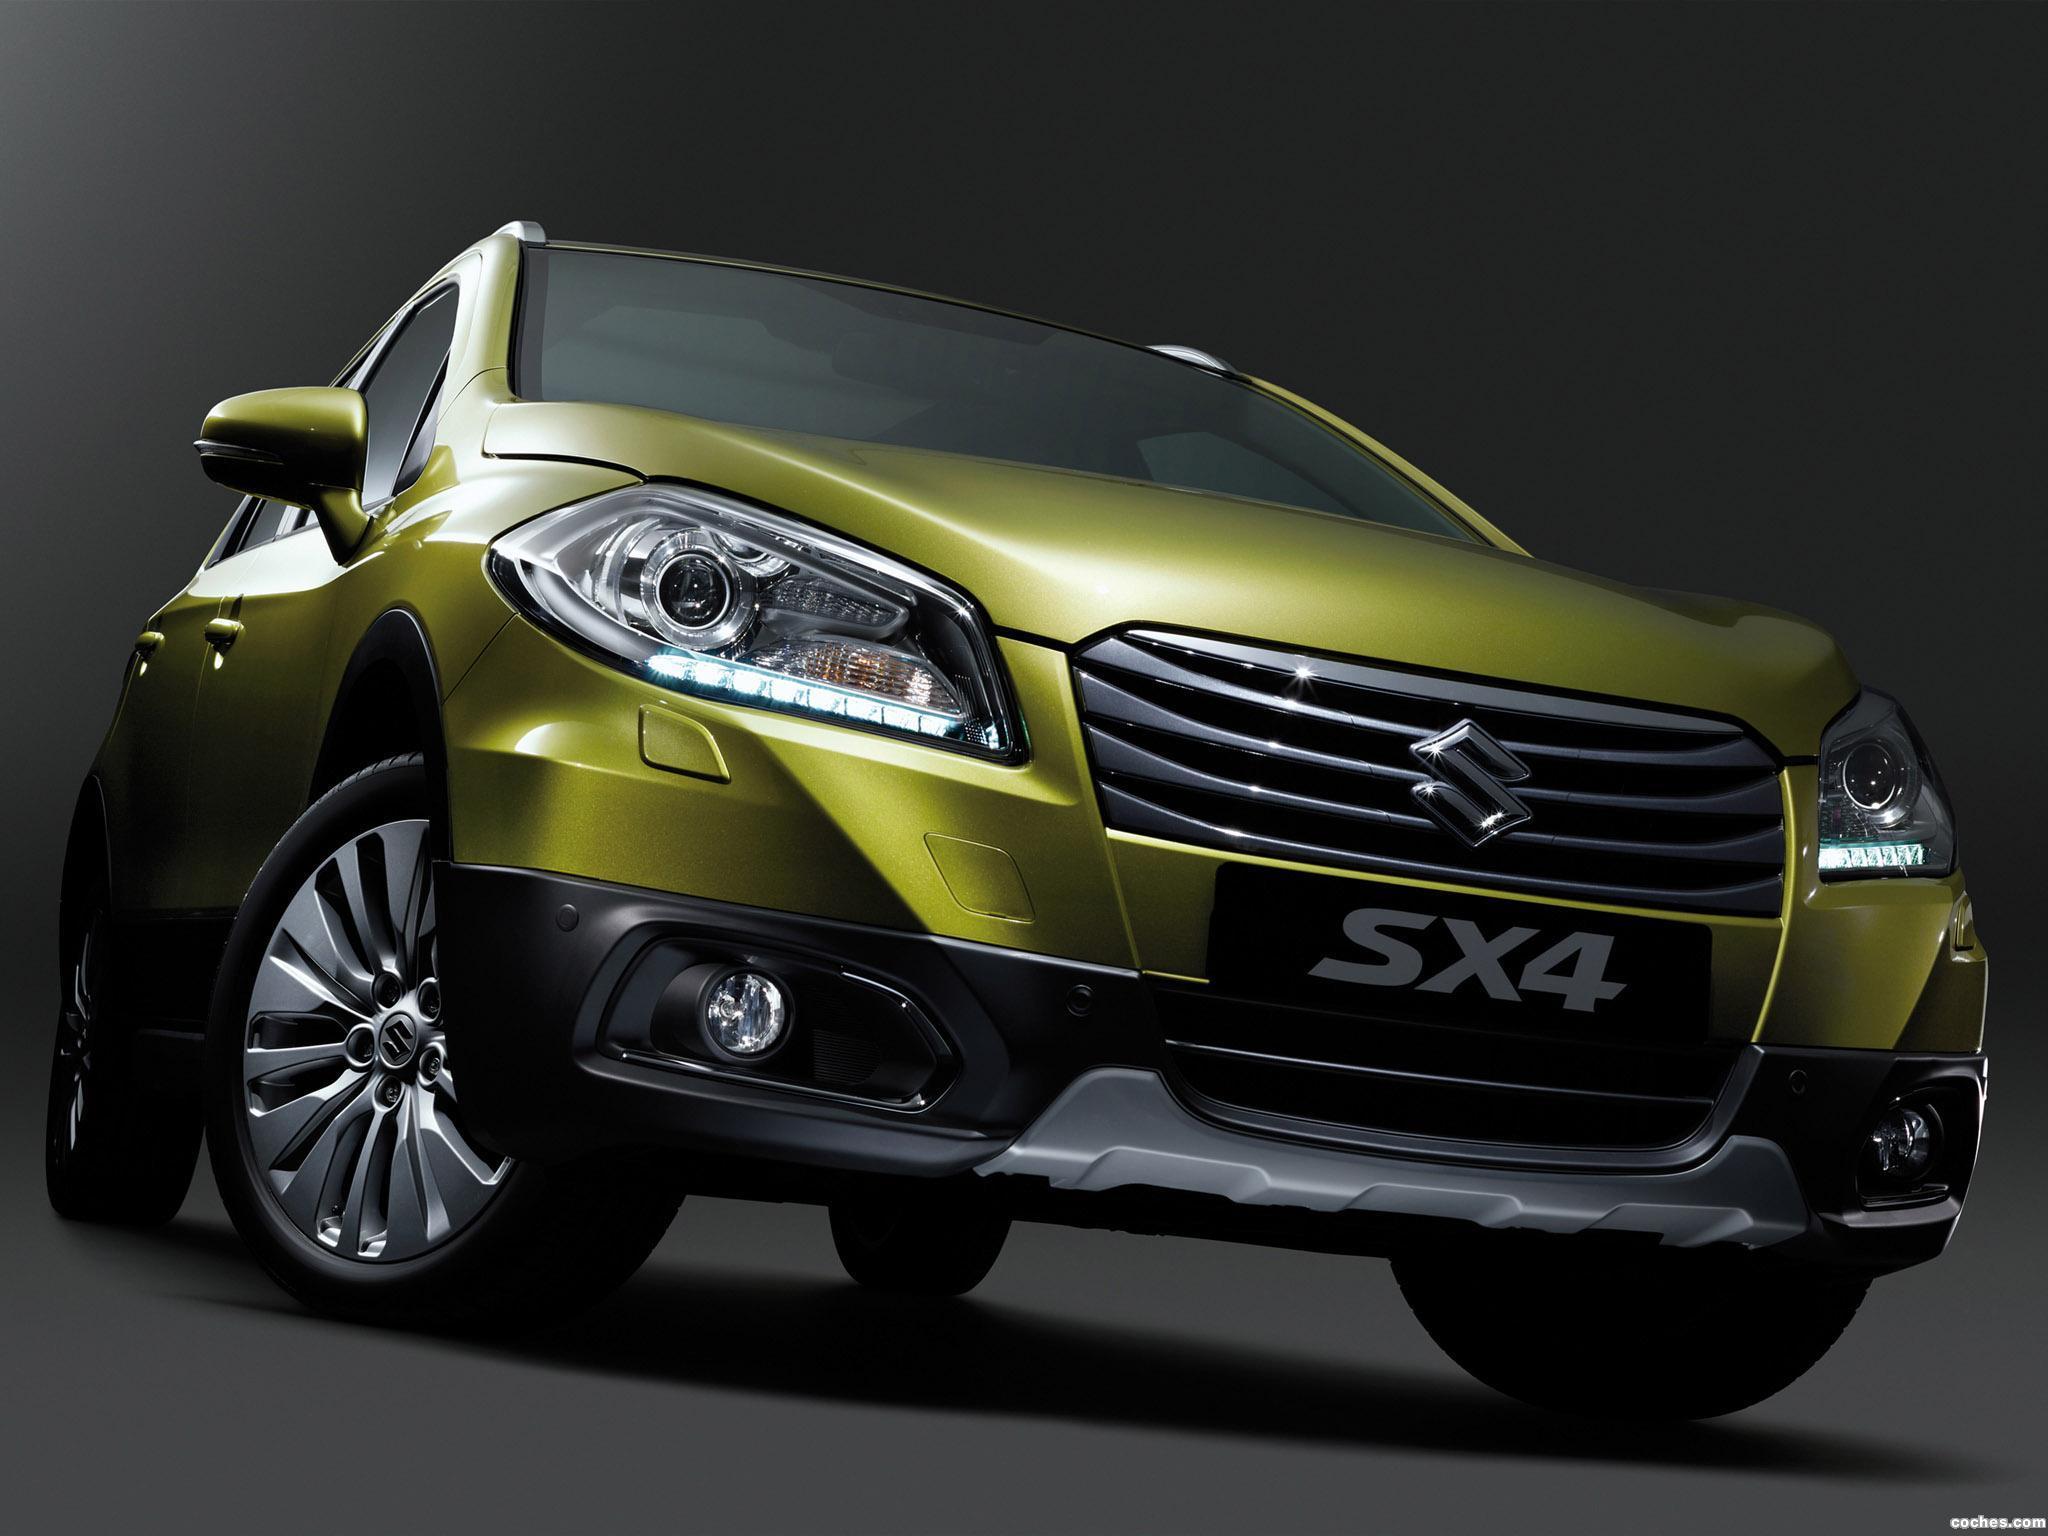 Foto 0 de Suzuki SX4 2013